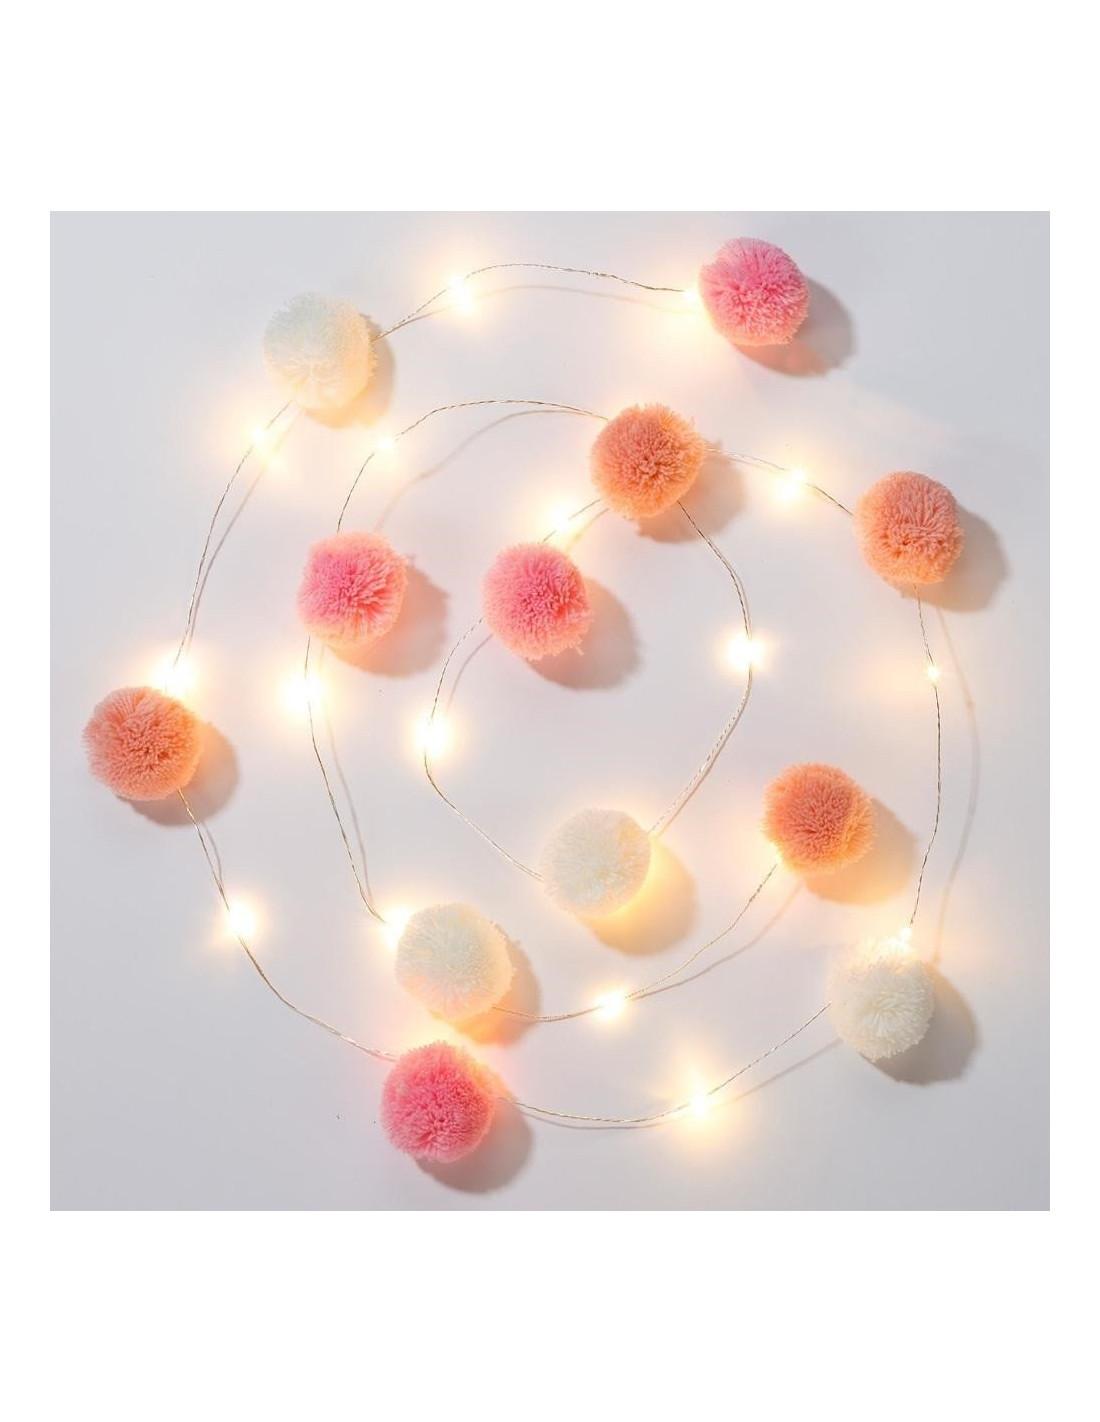 Guirlande Lumineuse Leds 17 Pompons Roses,Blancs, Pêche